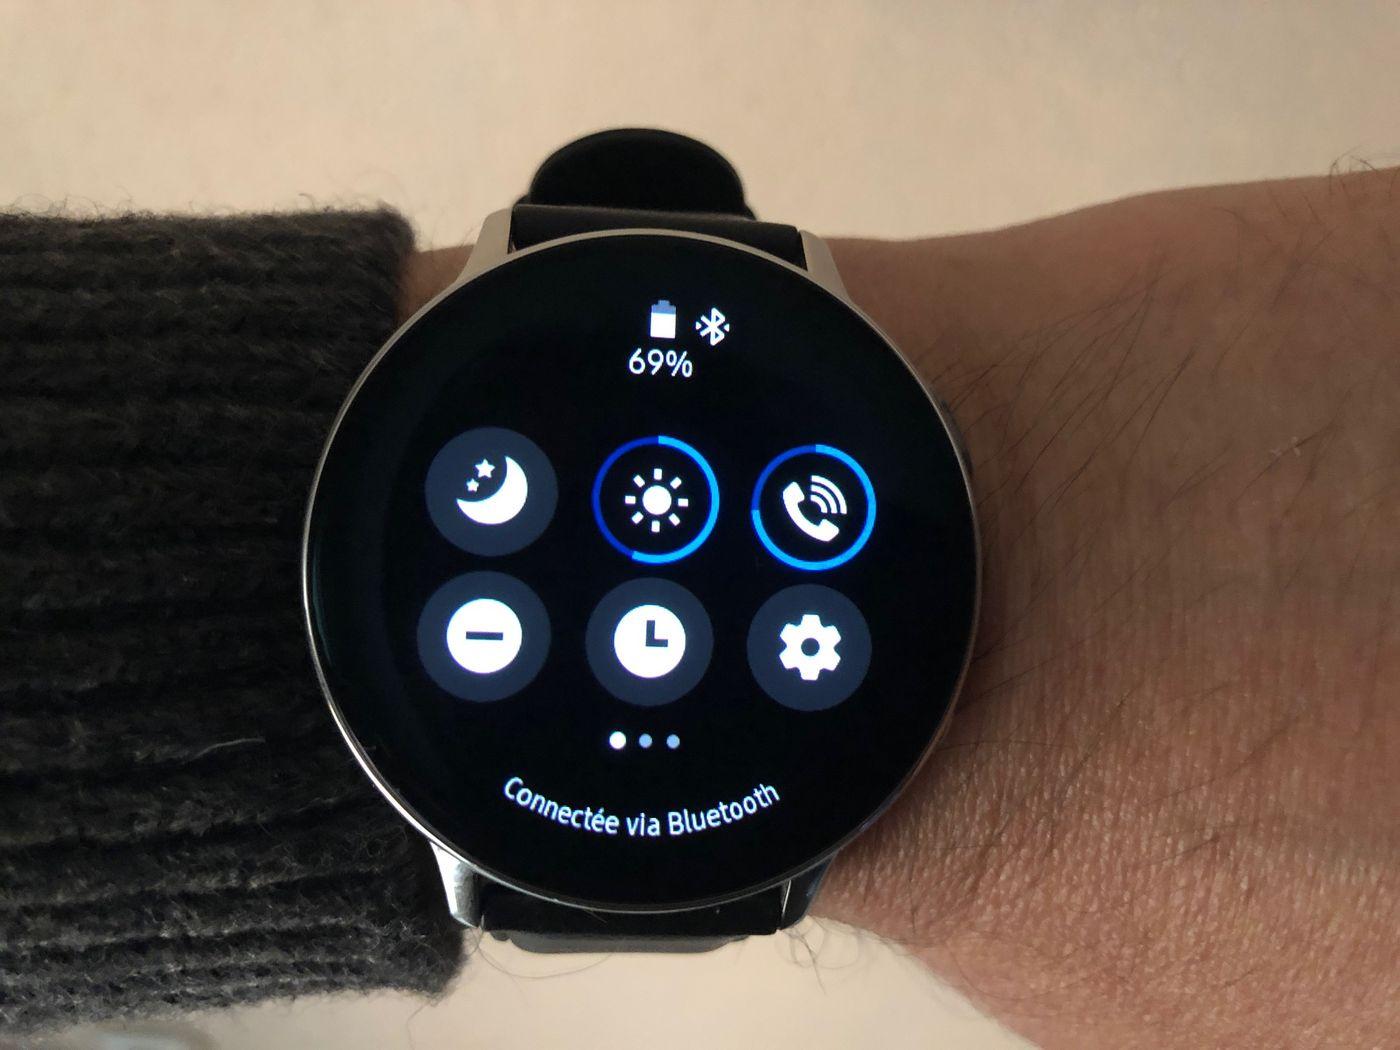 Galaxy Watch Active 2 Image 1